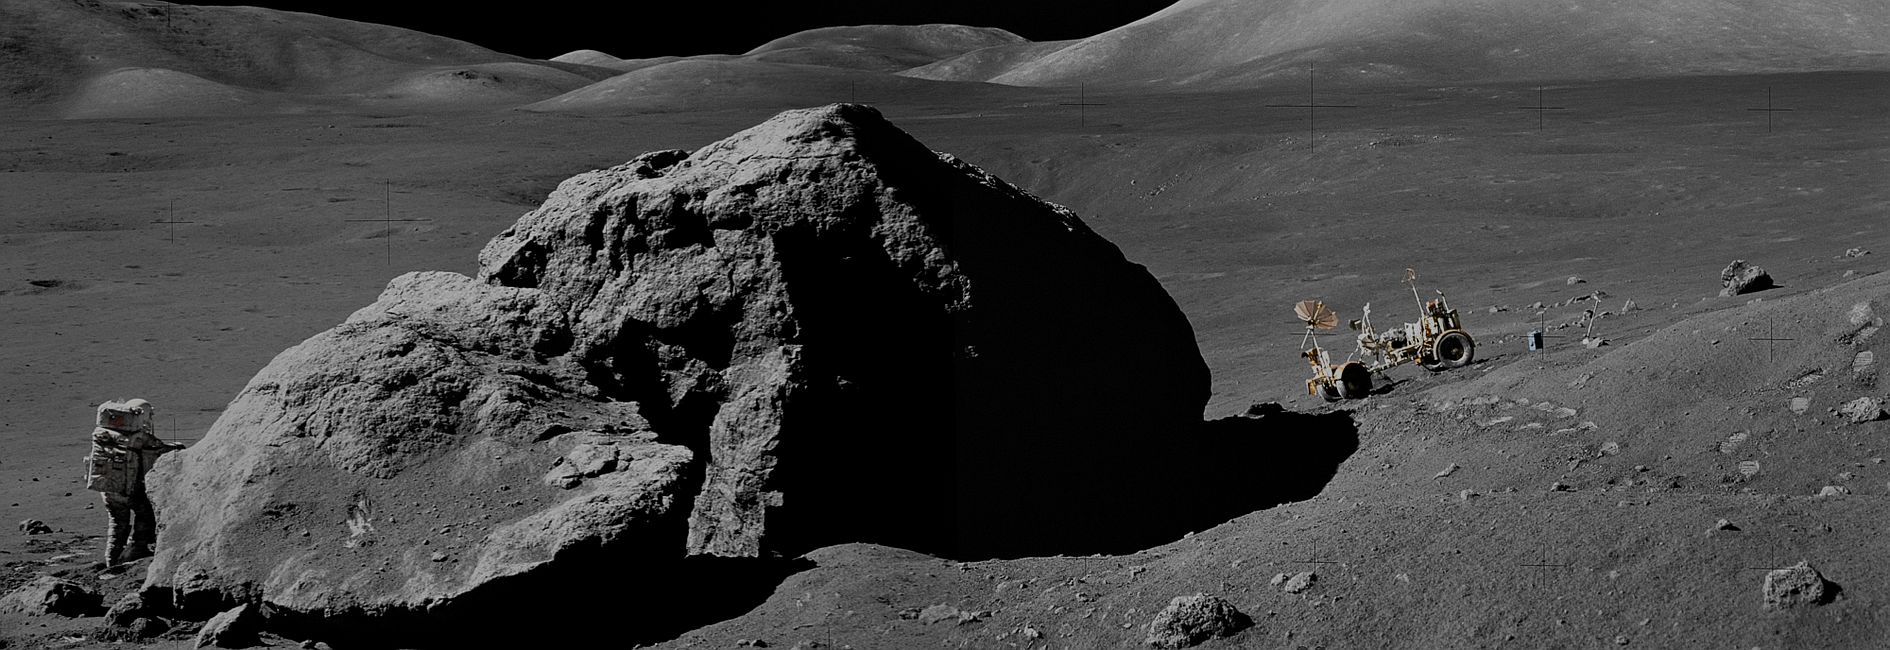 Lunar Rover Panorama (Header Image)